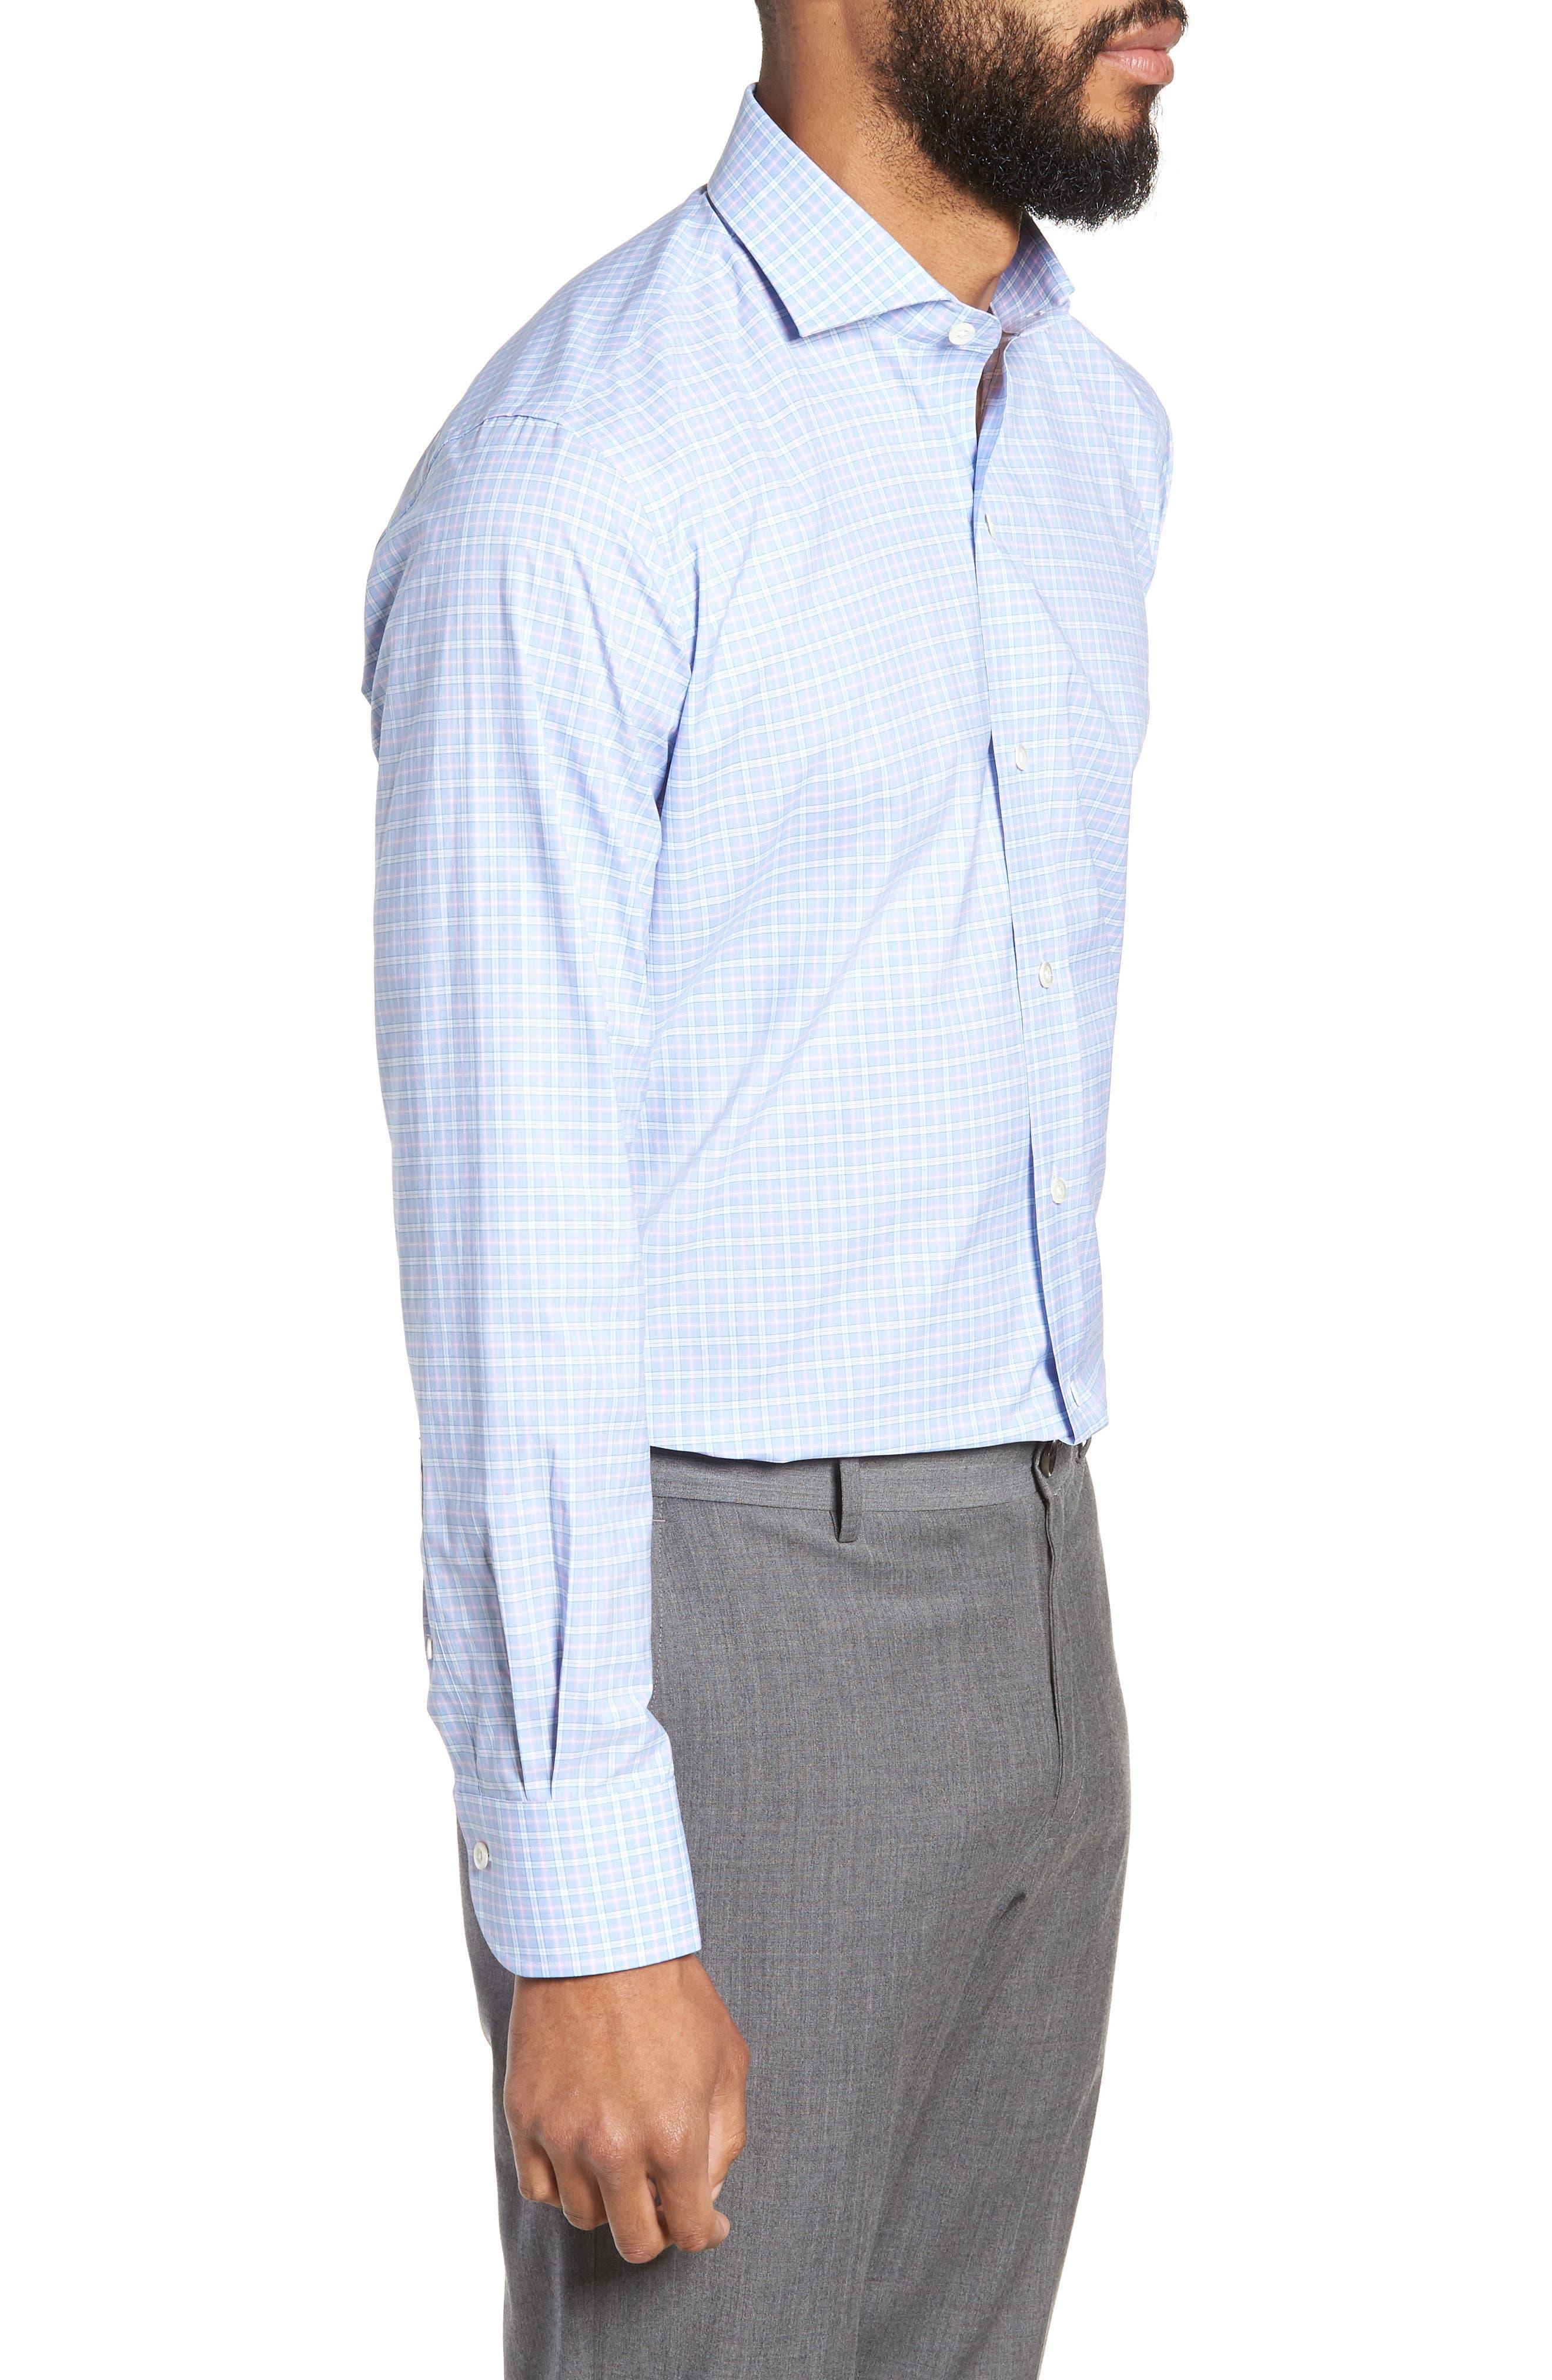 Ferris Slim Fit Check Dress Shirt,                             Alternate thumbnail 4, color,                             LIGHT/ PASTEL BLUE